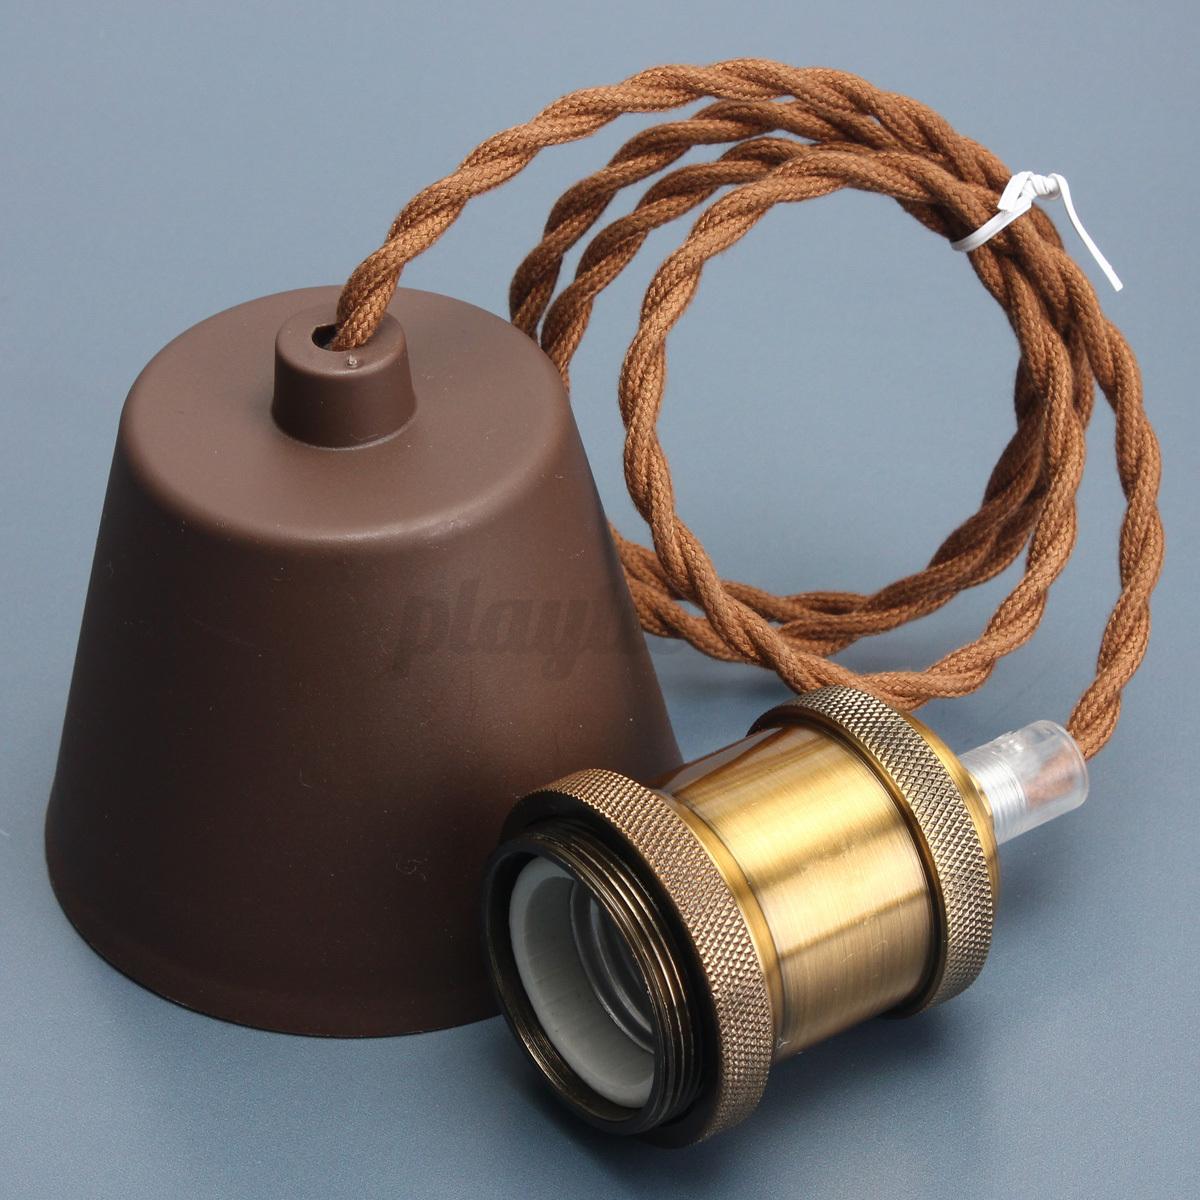 E27/E26 Edison Vintage Light Bulb Pendant Kit Lamp Holder